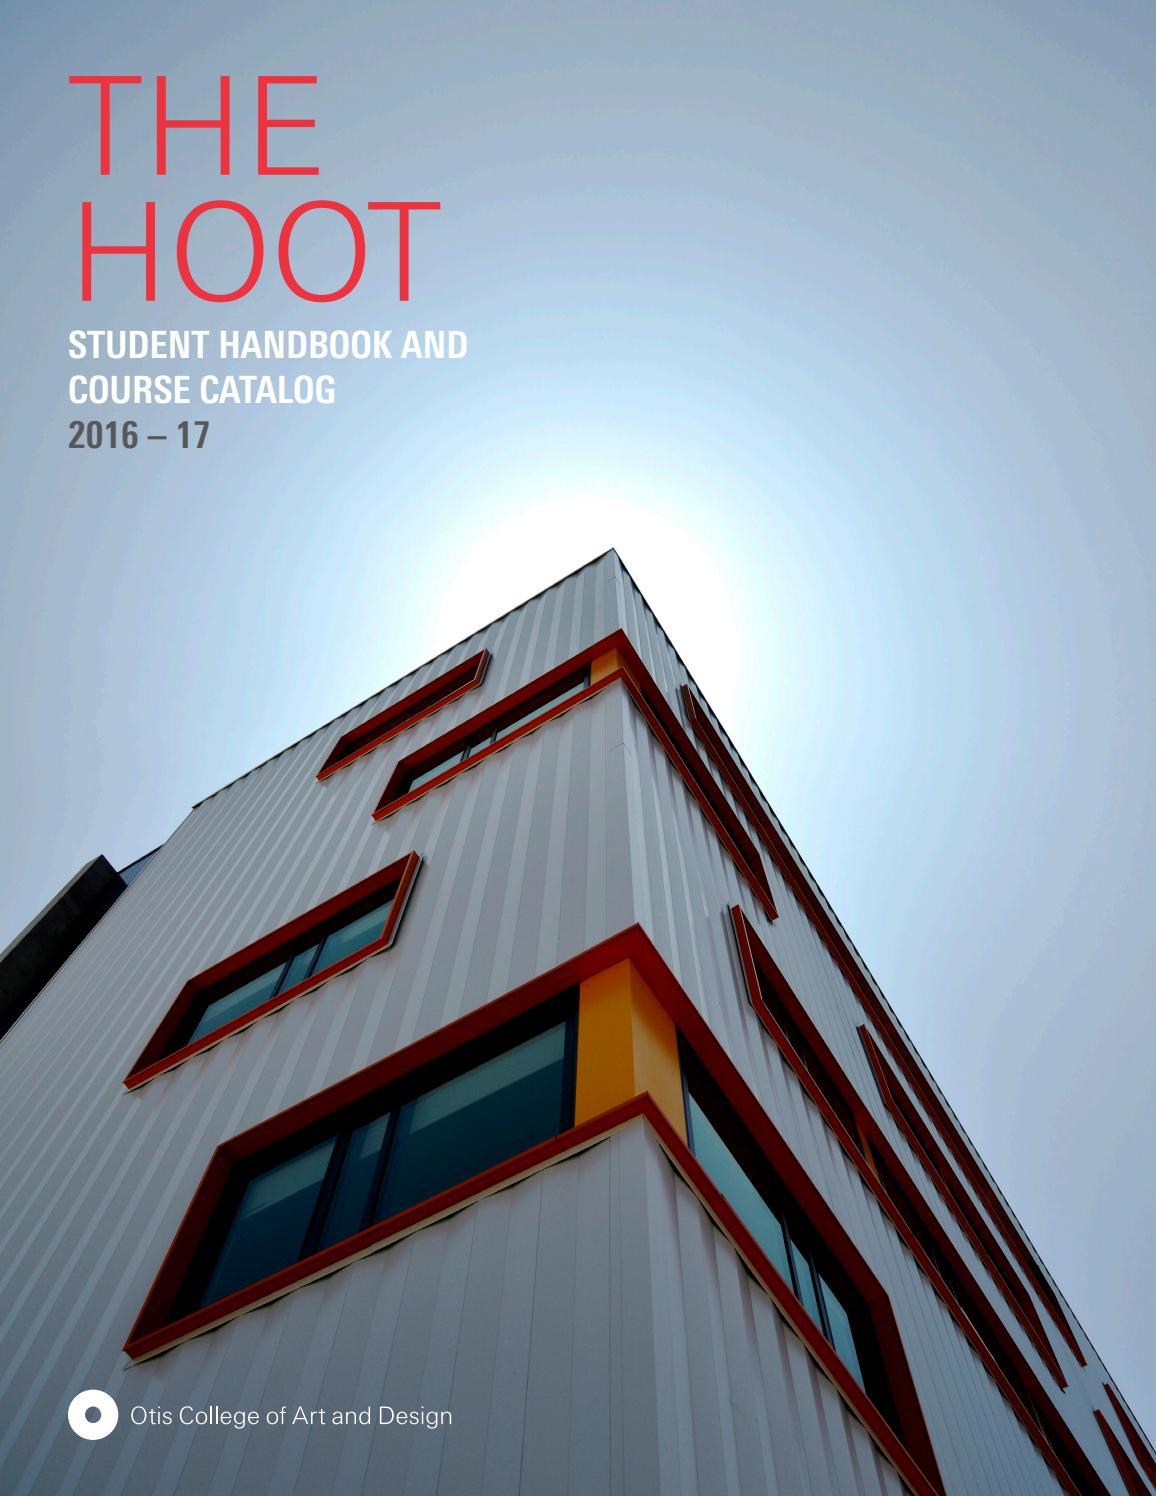 Otis catalog and handbook 2016 2017 by otis college of art otis catalog and handbook 2016 2017 by otis college of art design issuu buycottarizona